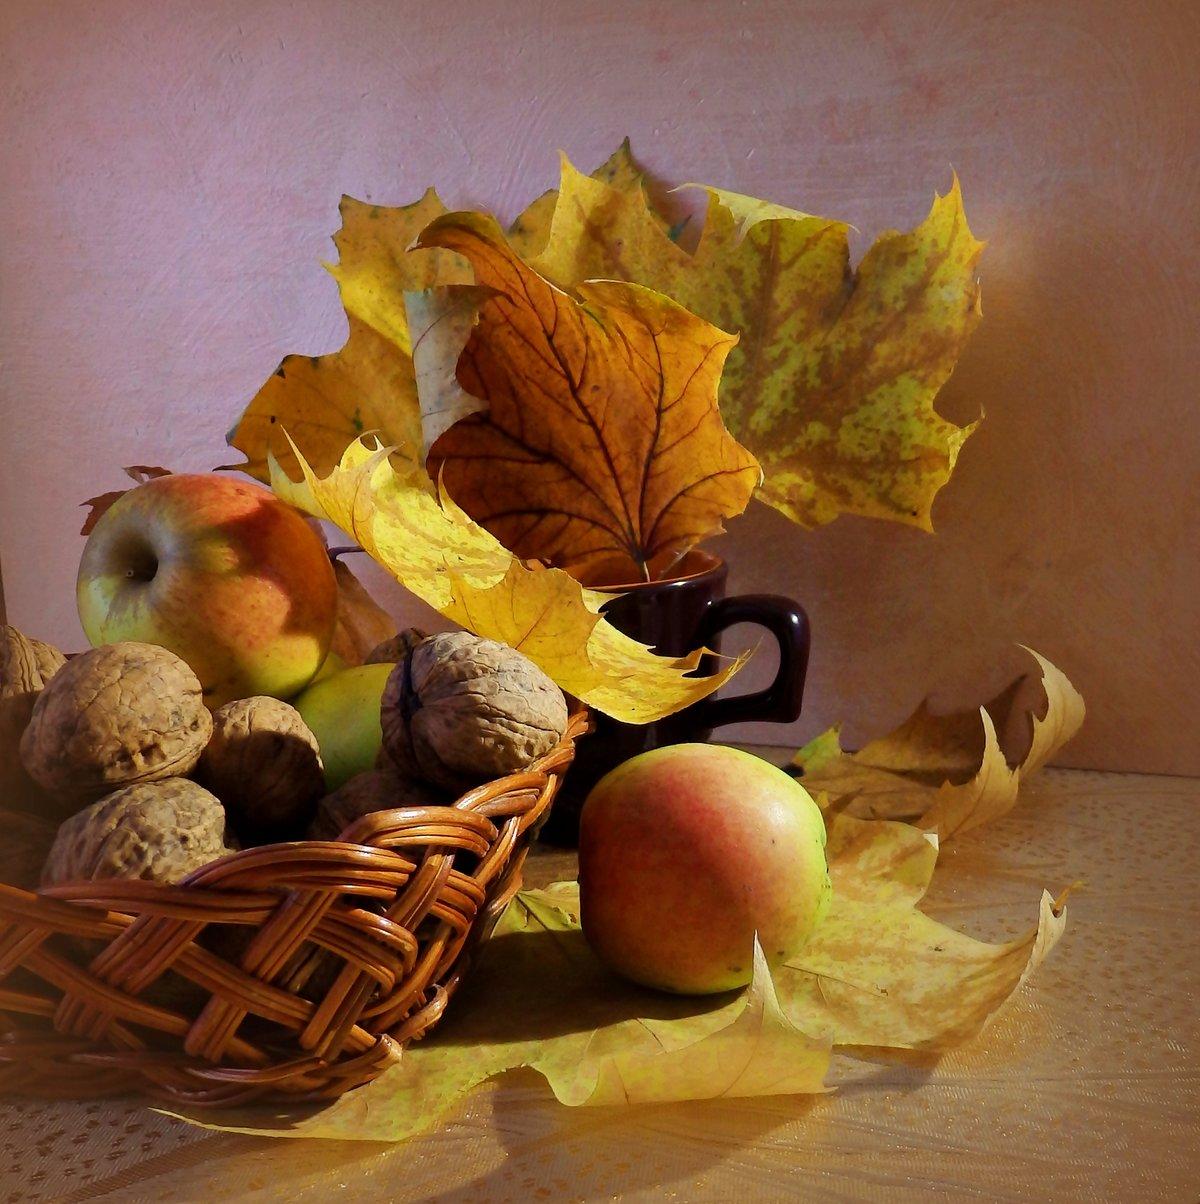 Осенний натюрморт открытки